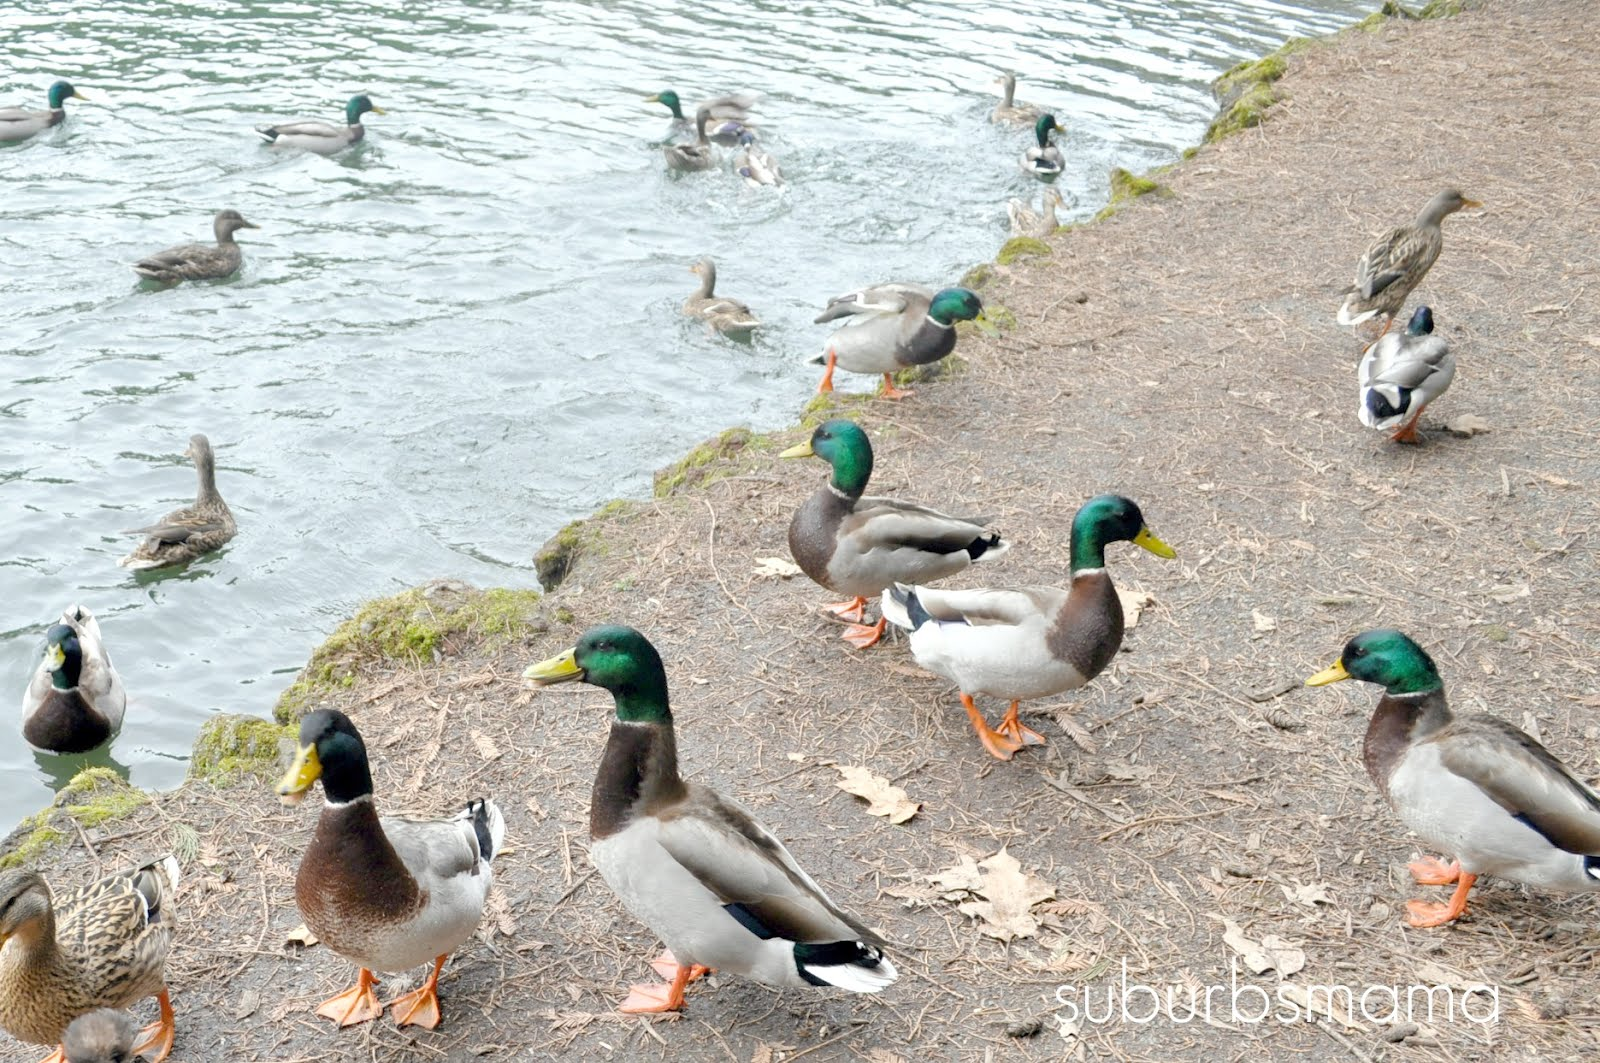 Ducky free amuatuer porn